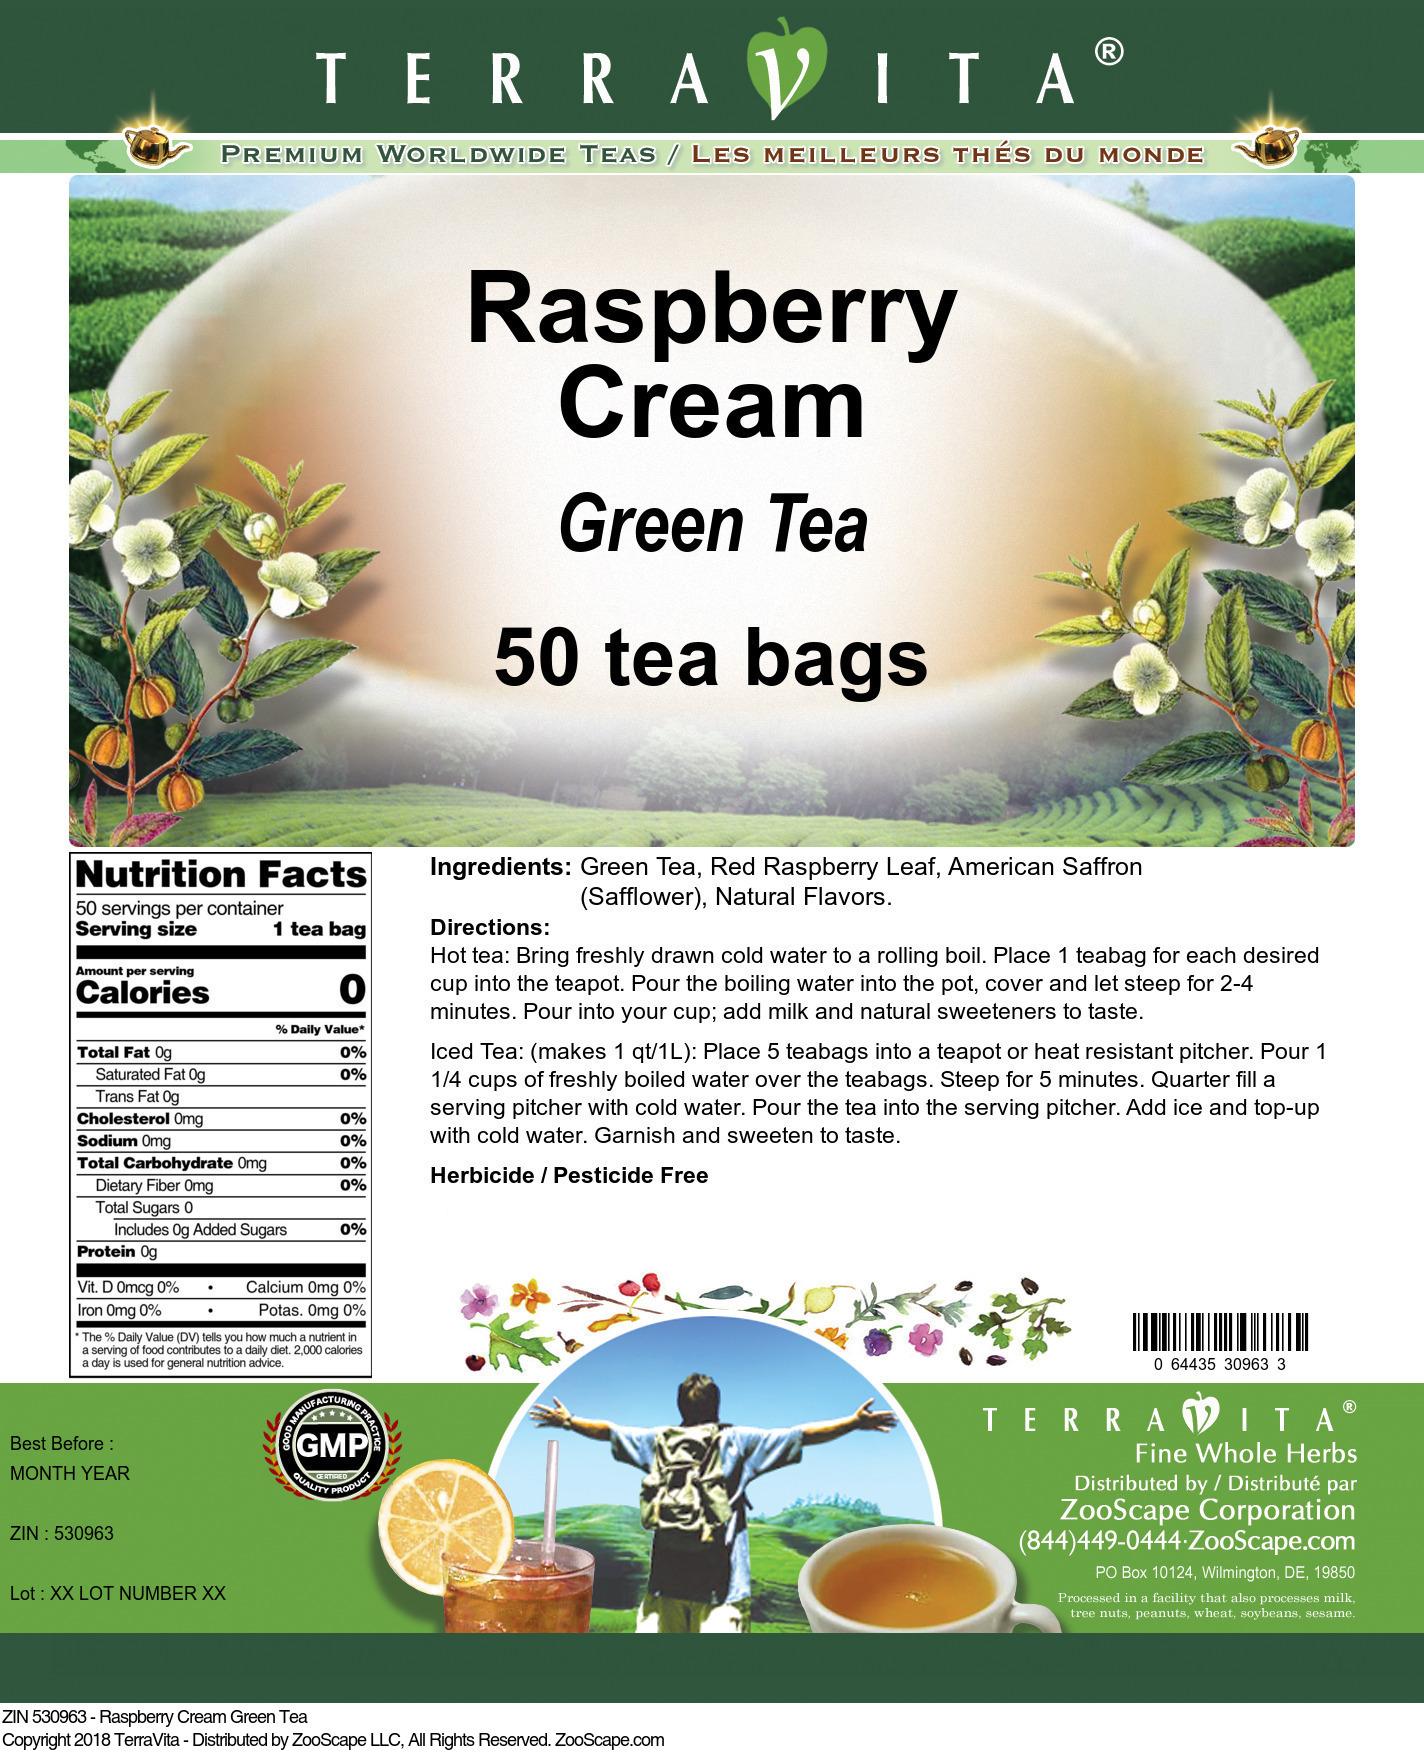 Raspberry Cream Green Tea